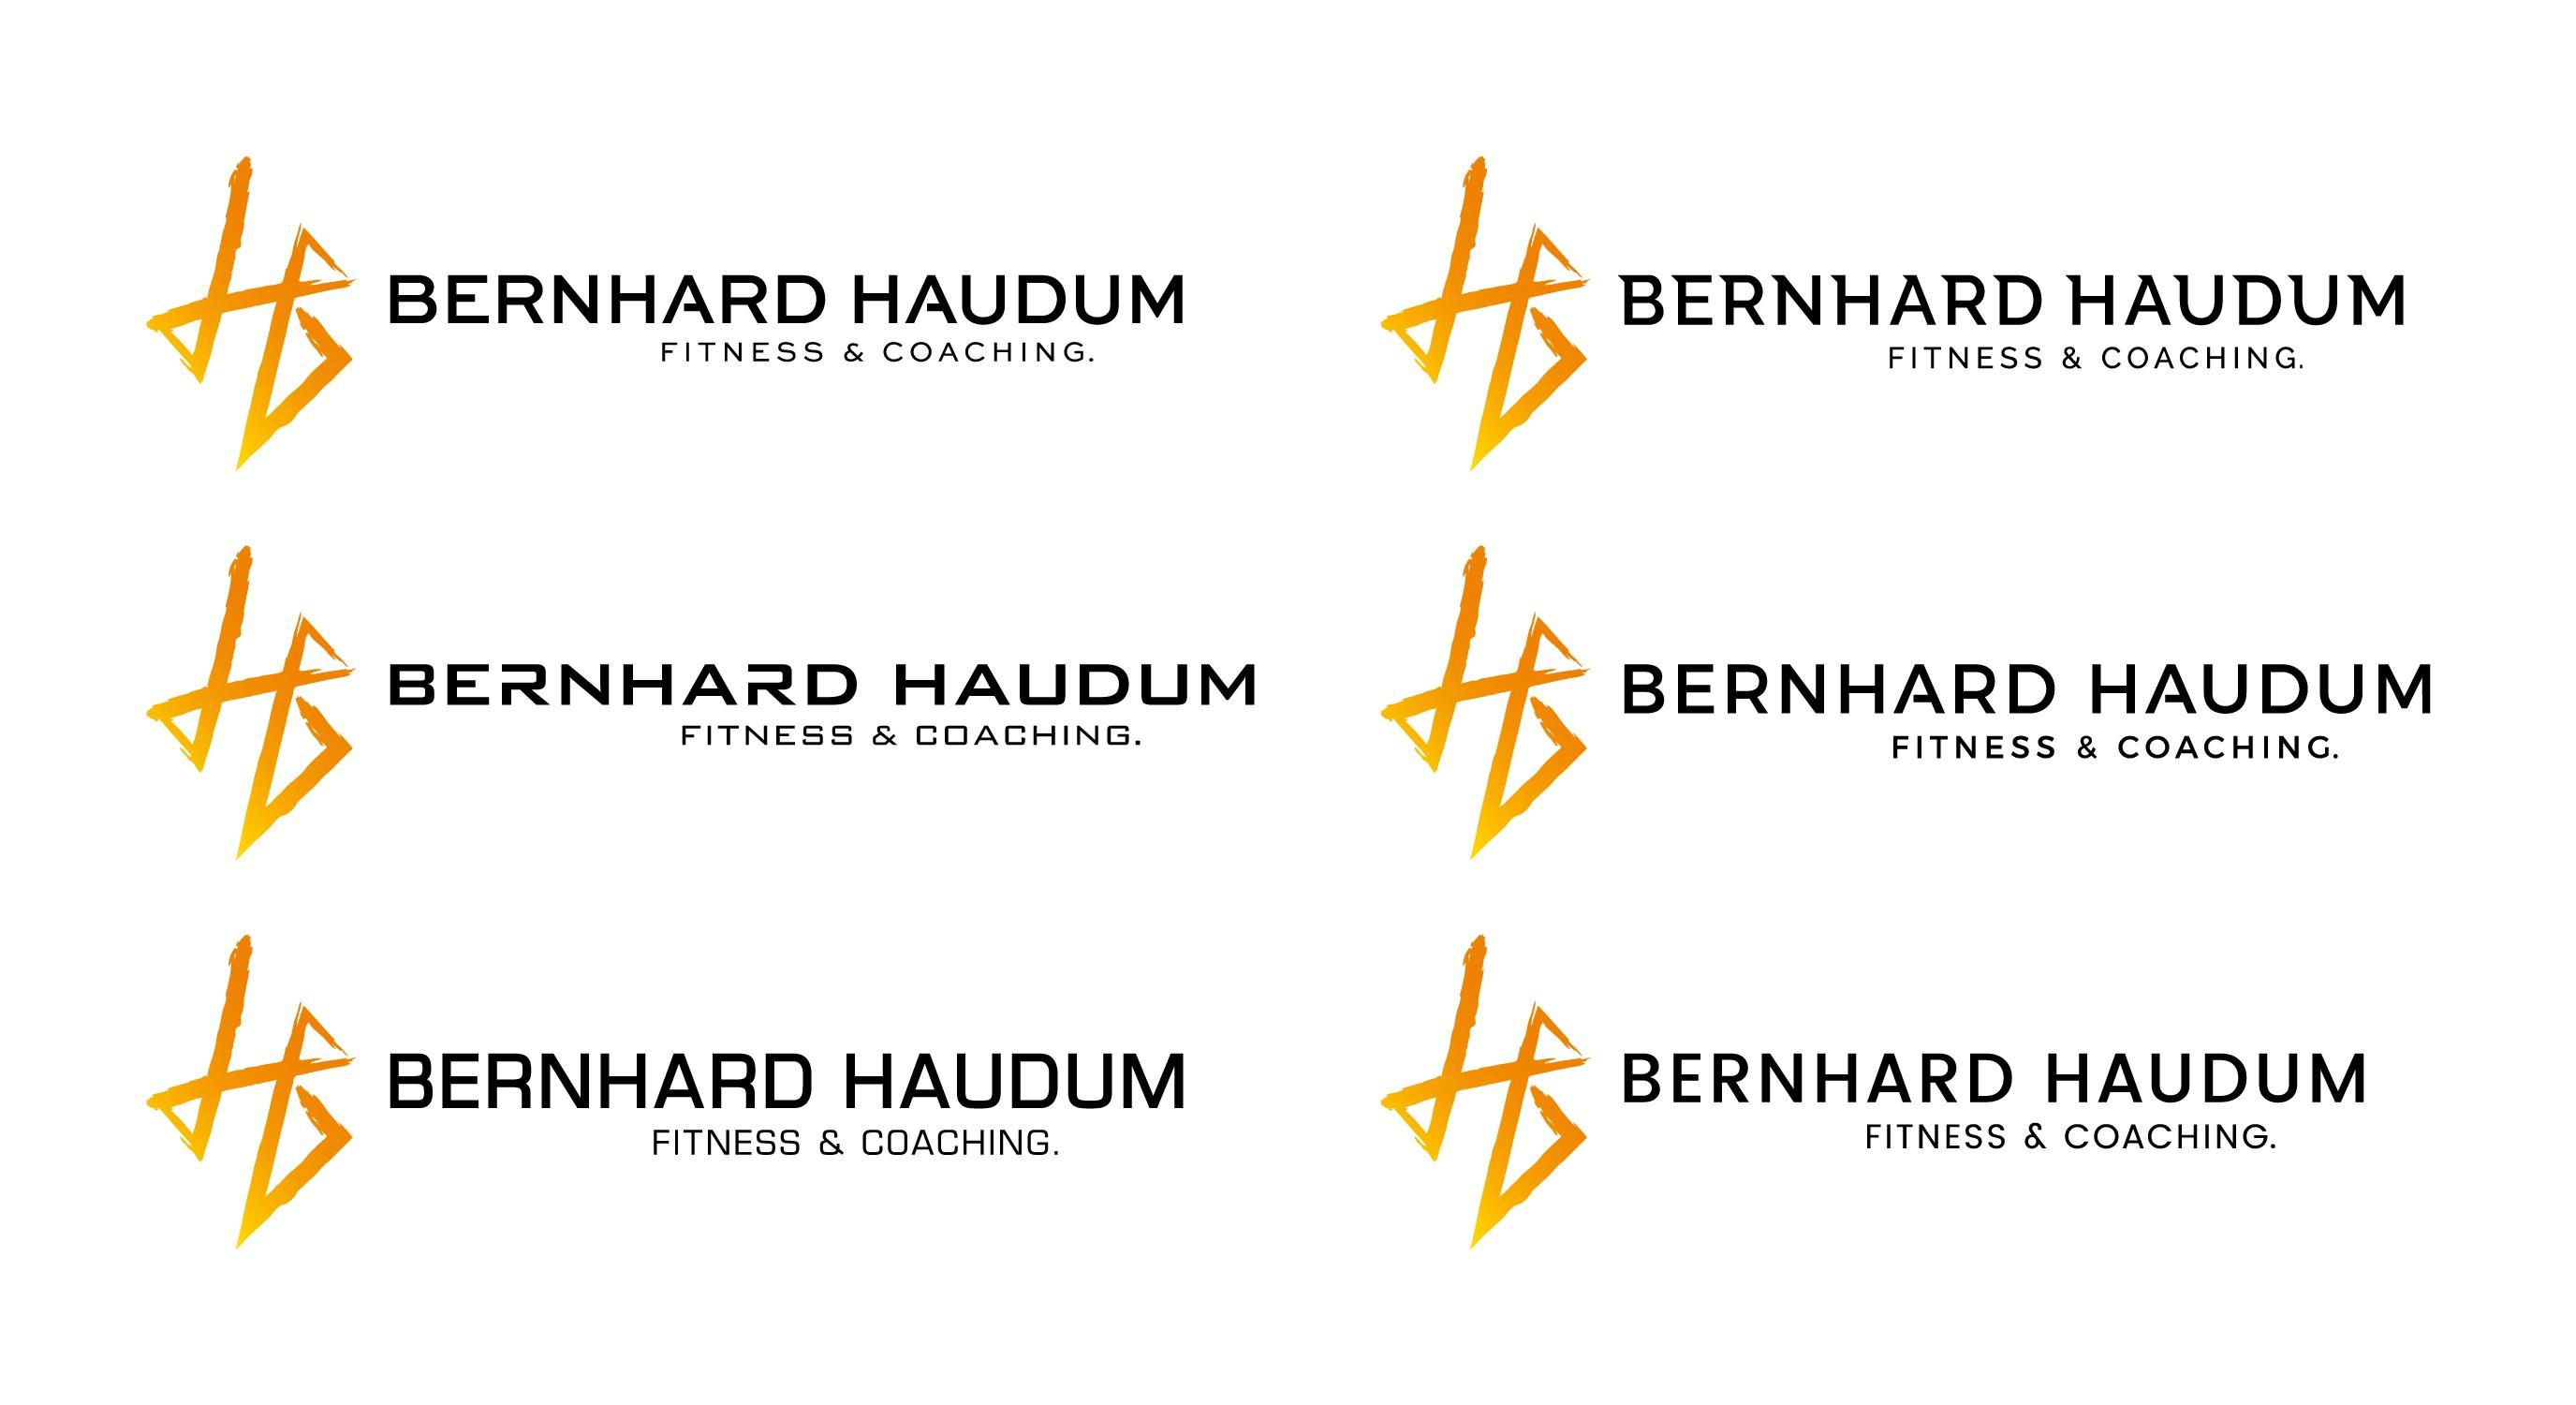 Fitness & Coaching. New Logo. Flash me.